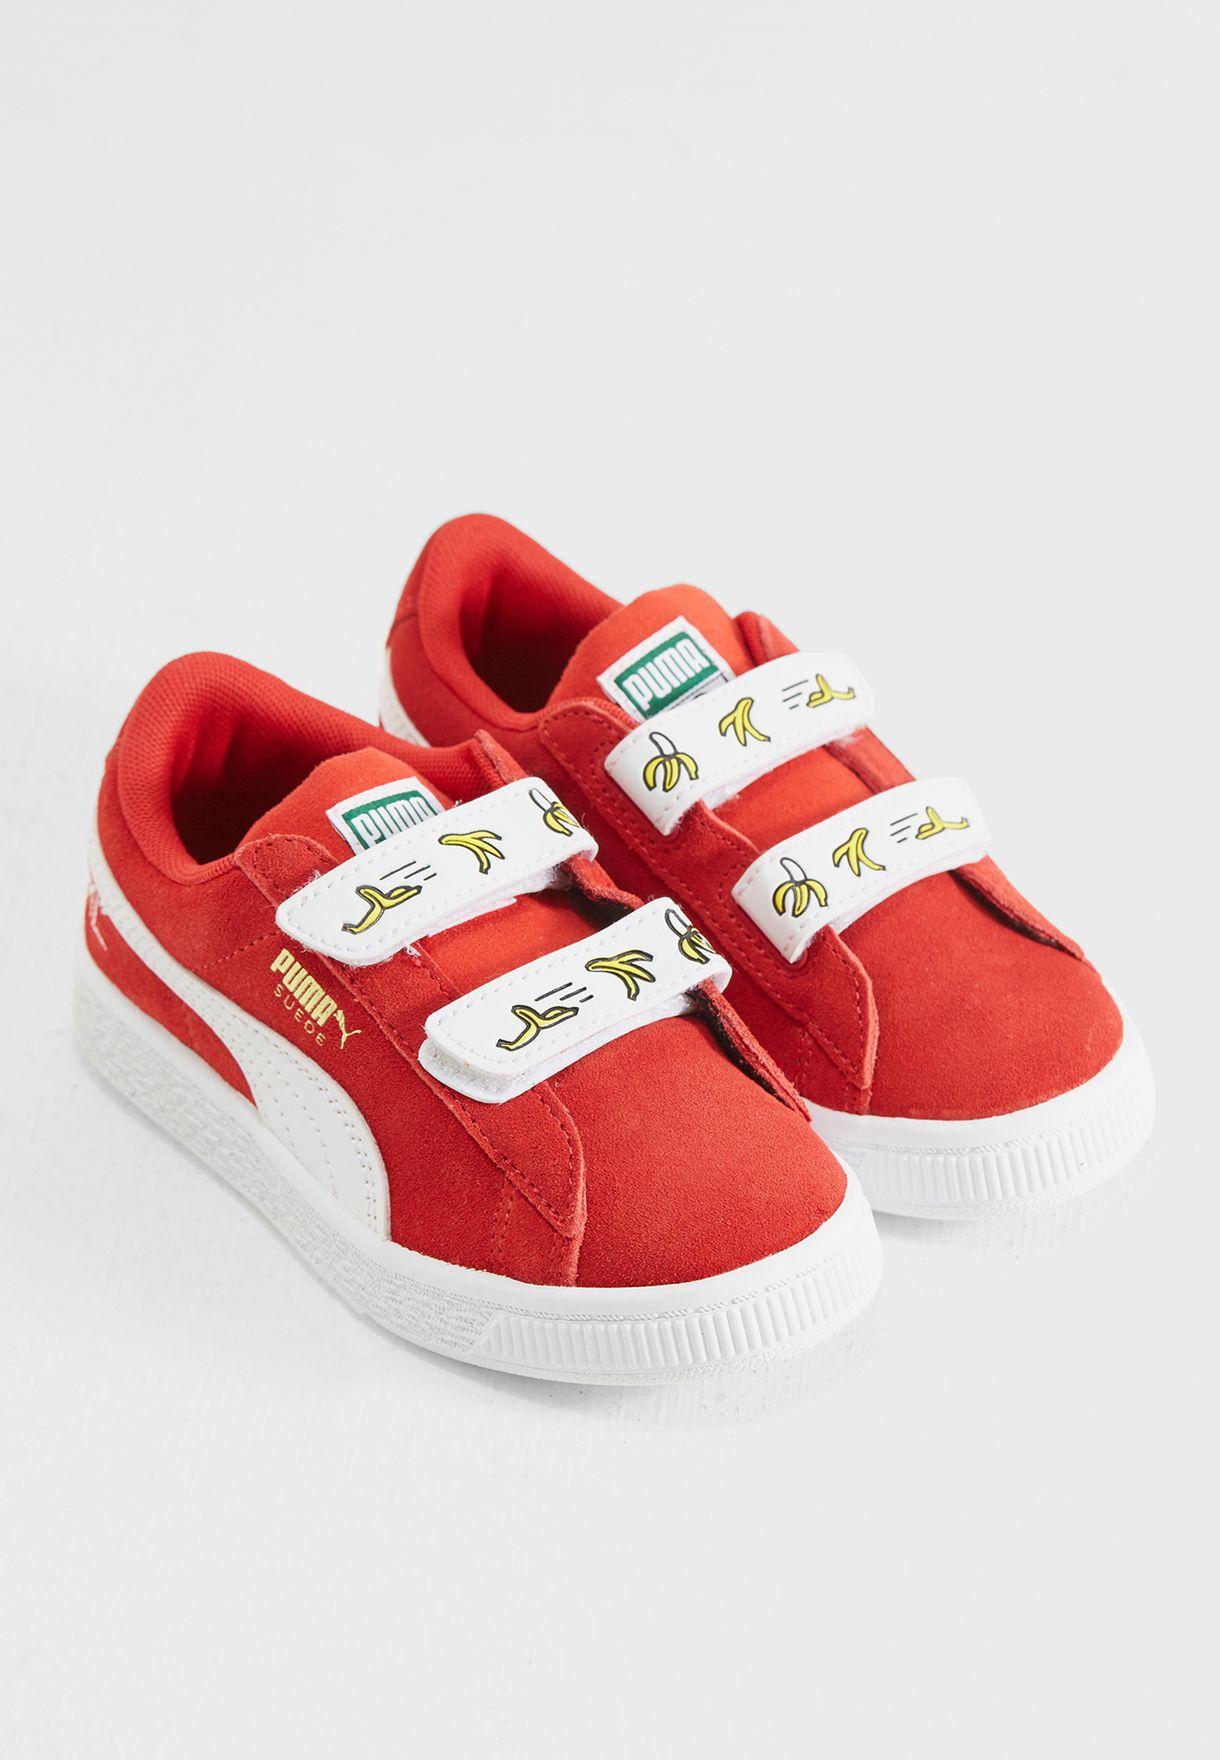 a684bc69c21977 Shop PUMA red Minions Suede V Kids 36552801 for Kids in UAE ...